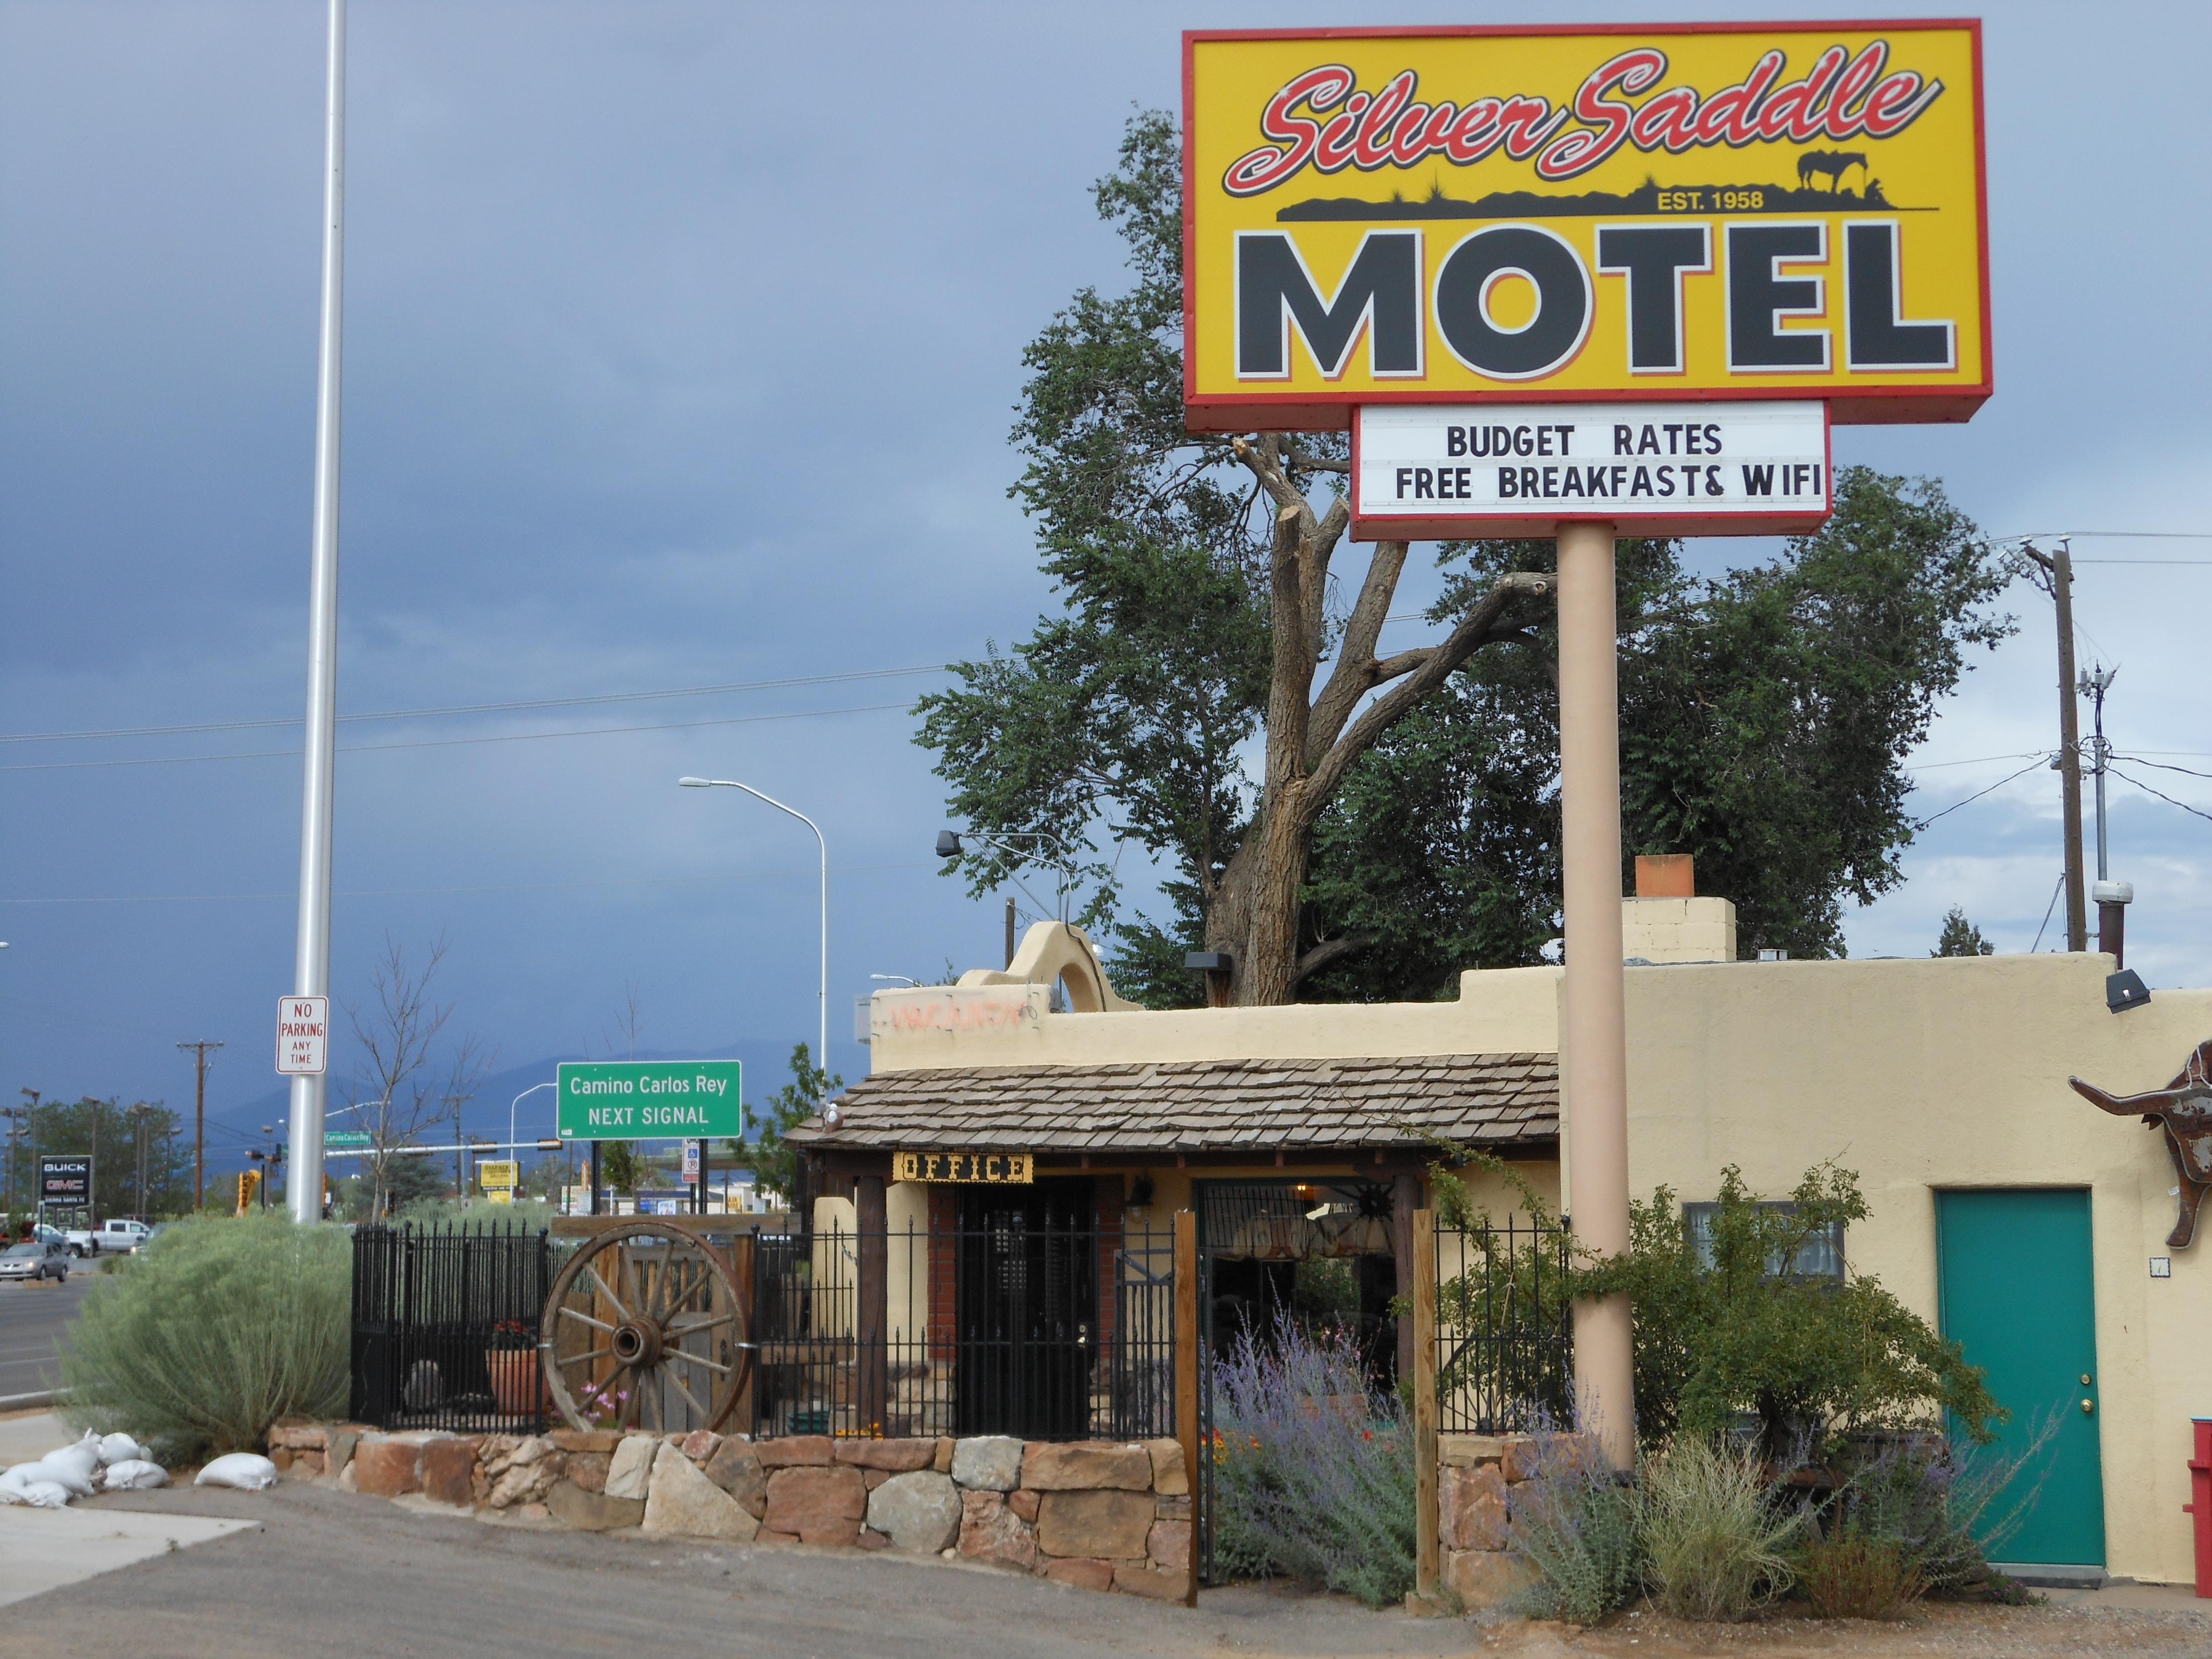 route 66 santa fe 2013 sauro motel sauro motel. Black Bedroom Furniture Sets. Home Design Ideas